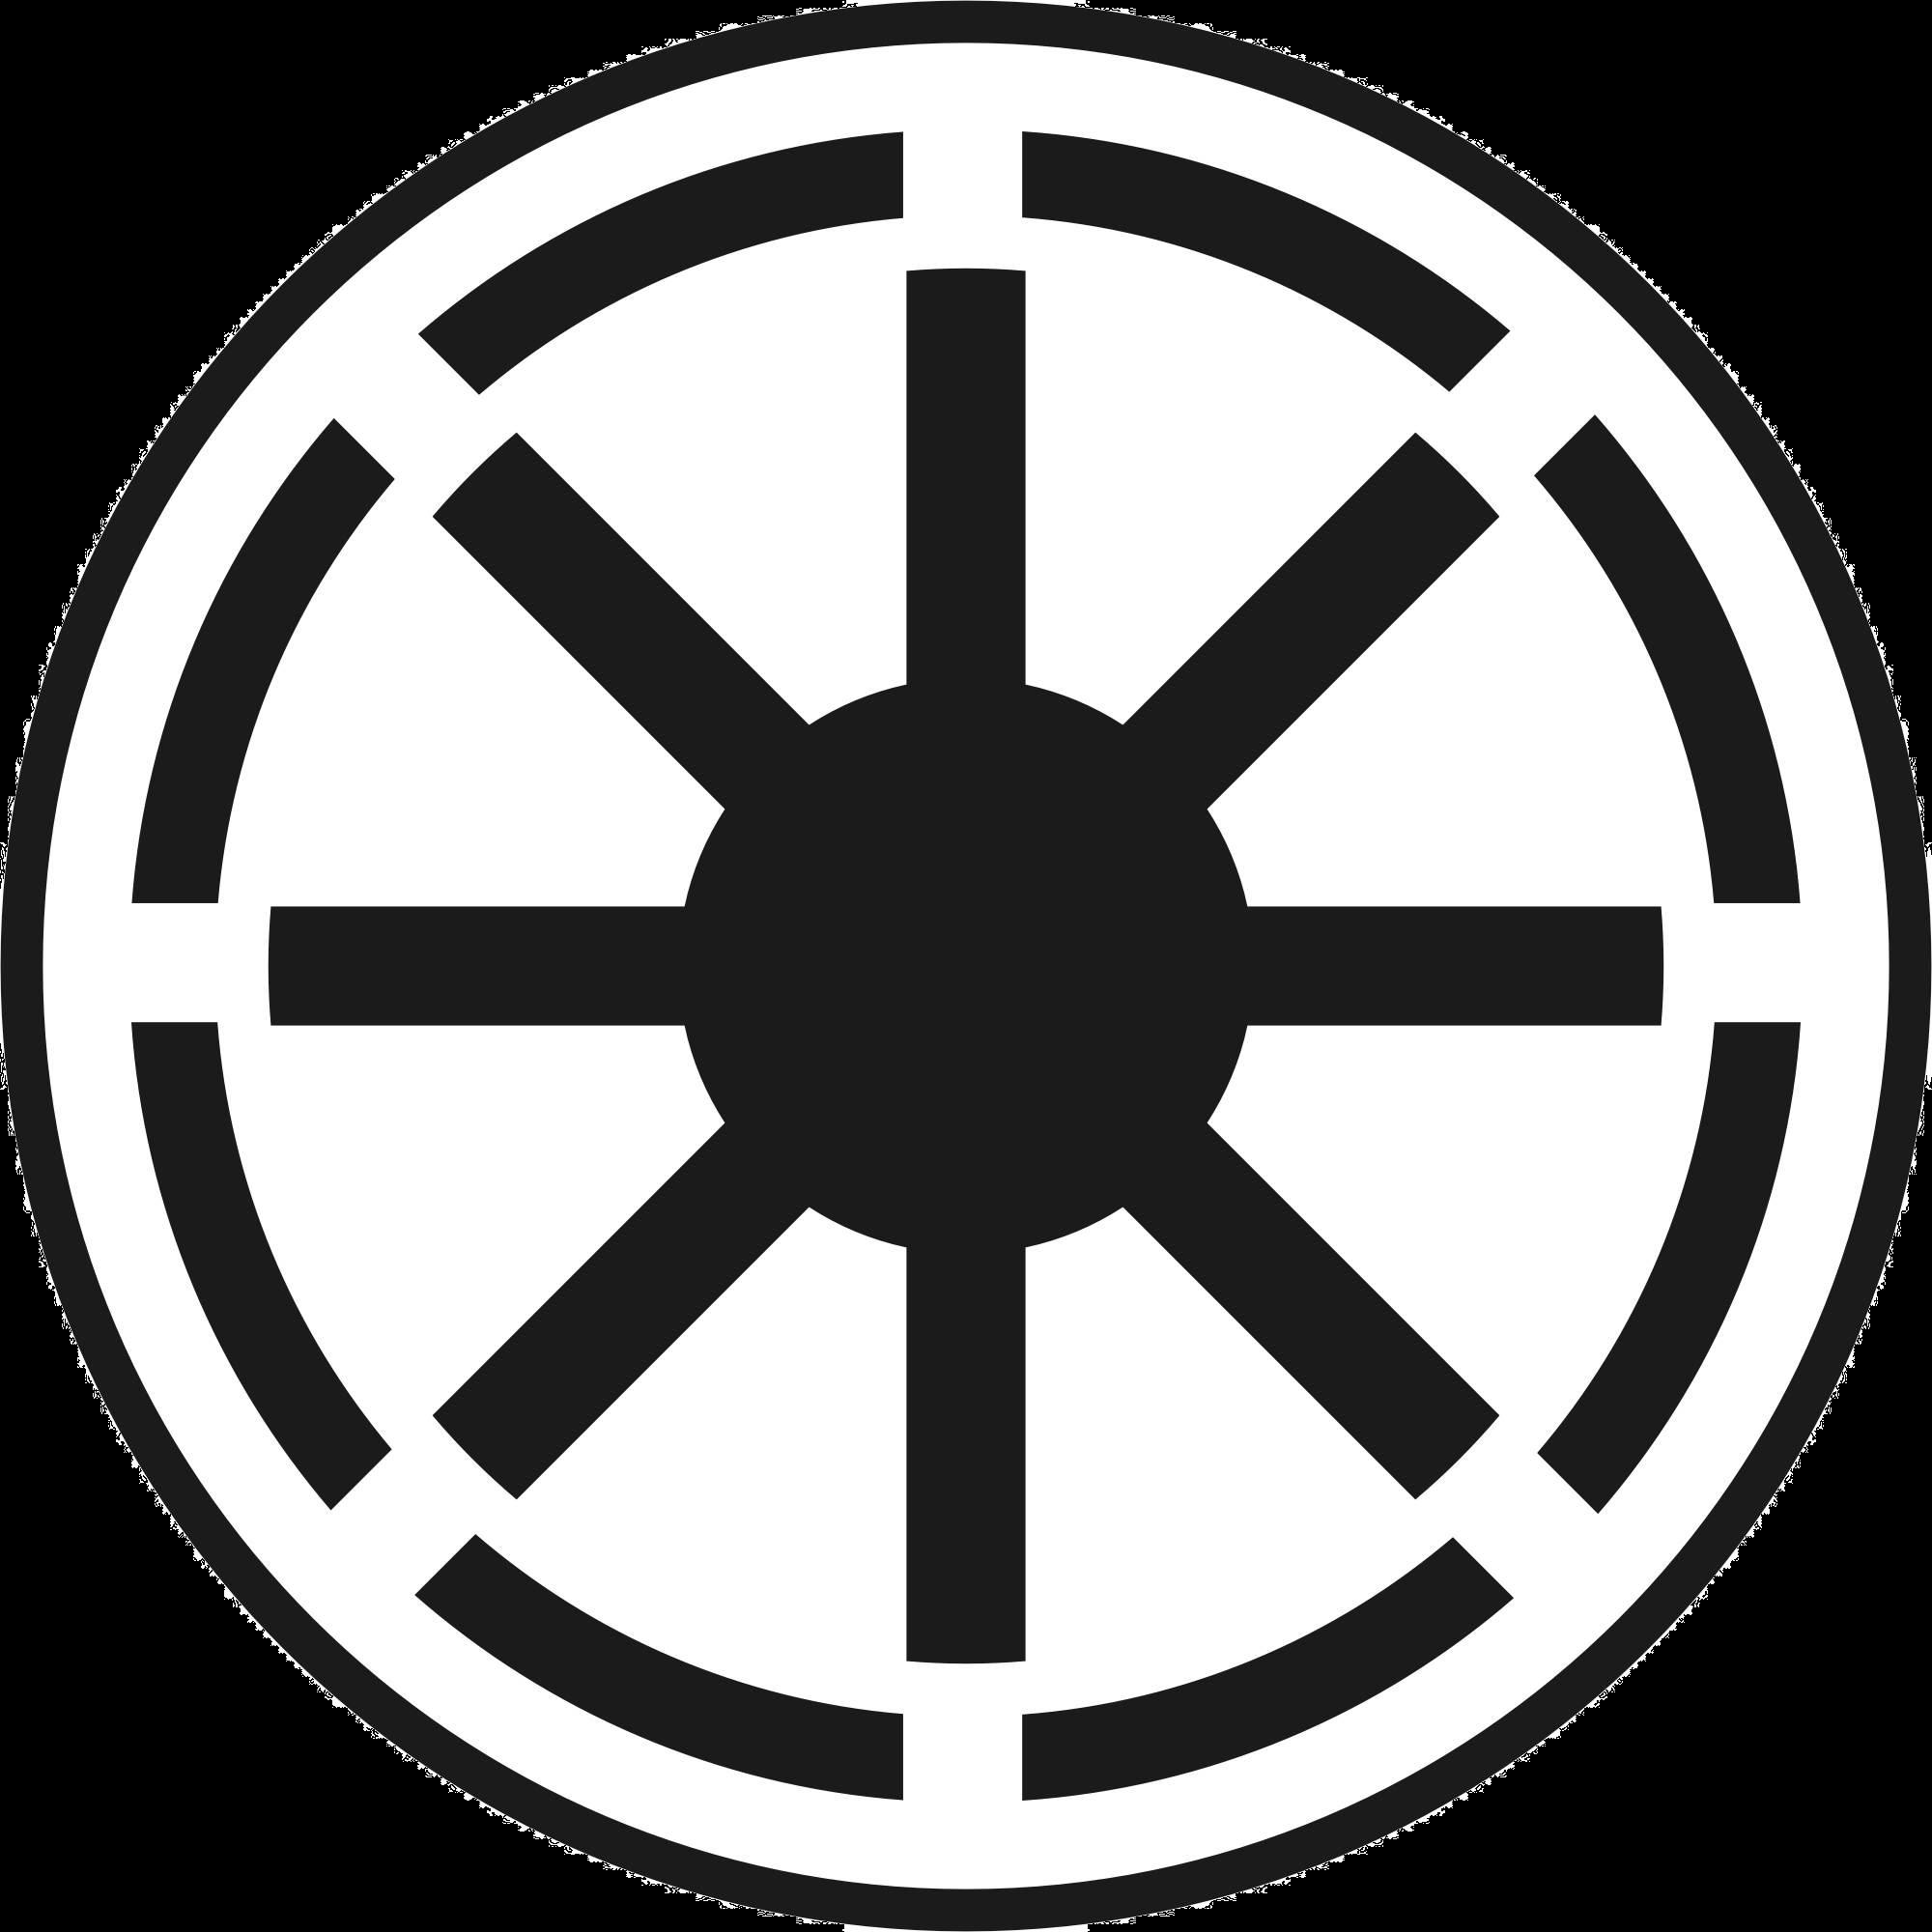 Republic file battlefront ii strikes back mod for star - Republic star wars logo ...